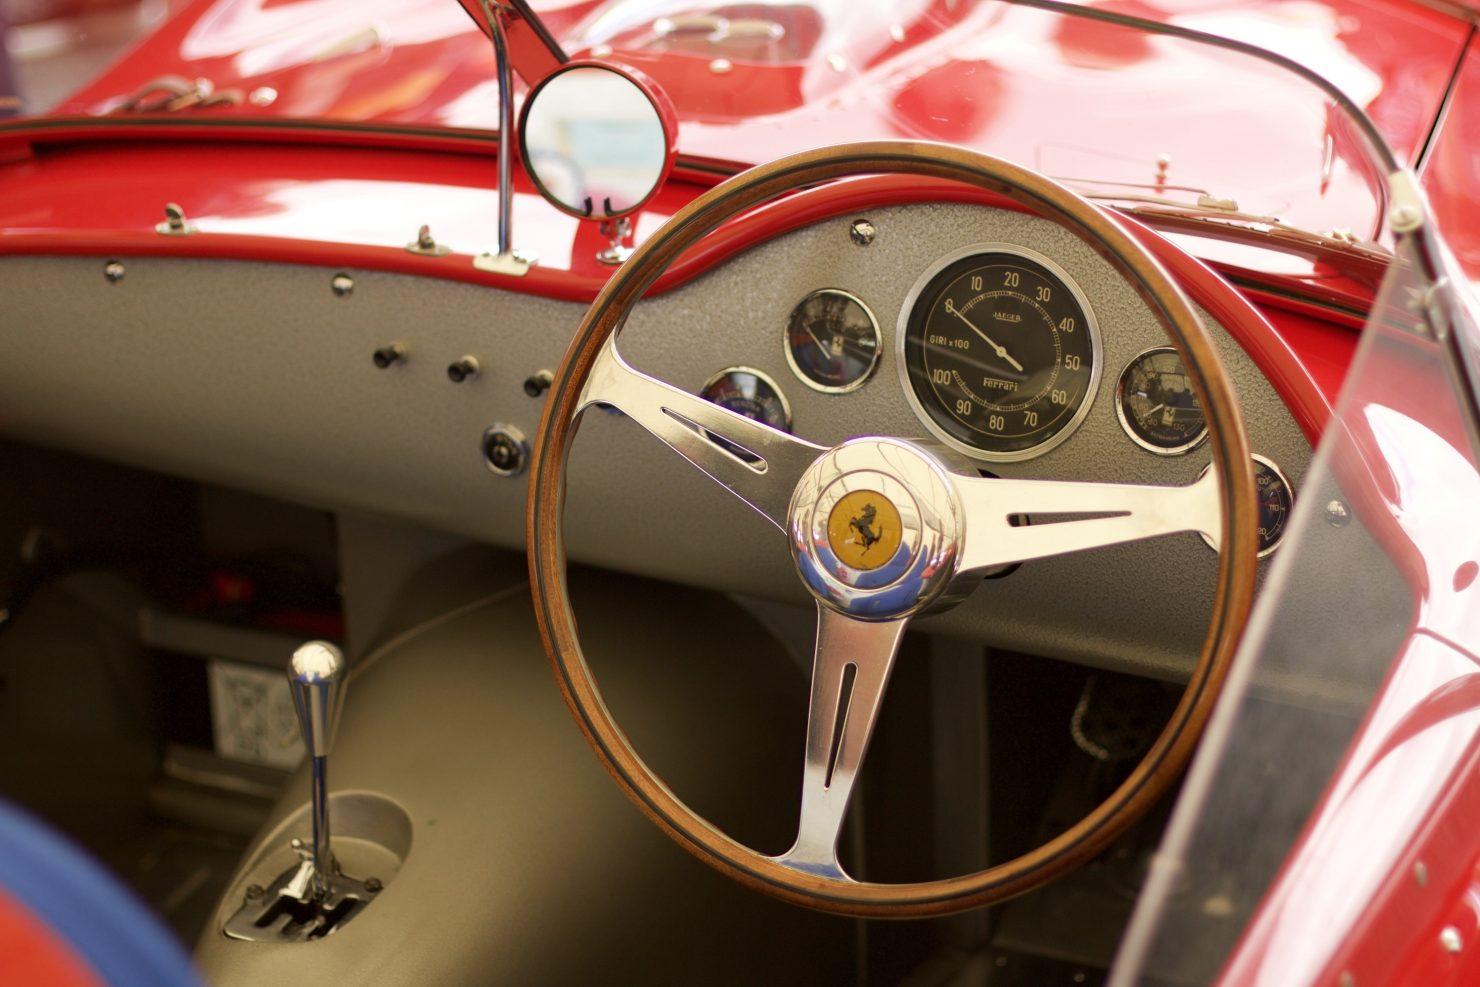 1959 Ferrari 250 TR59slash60 1480x987 - Cockpits of Goodwood